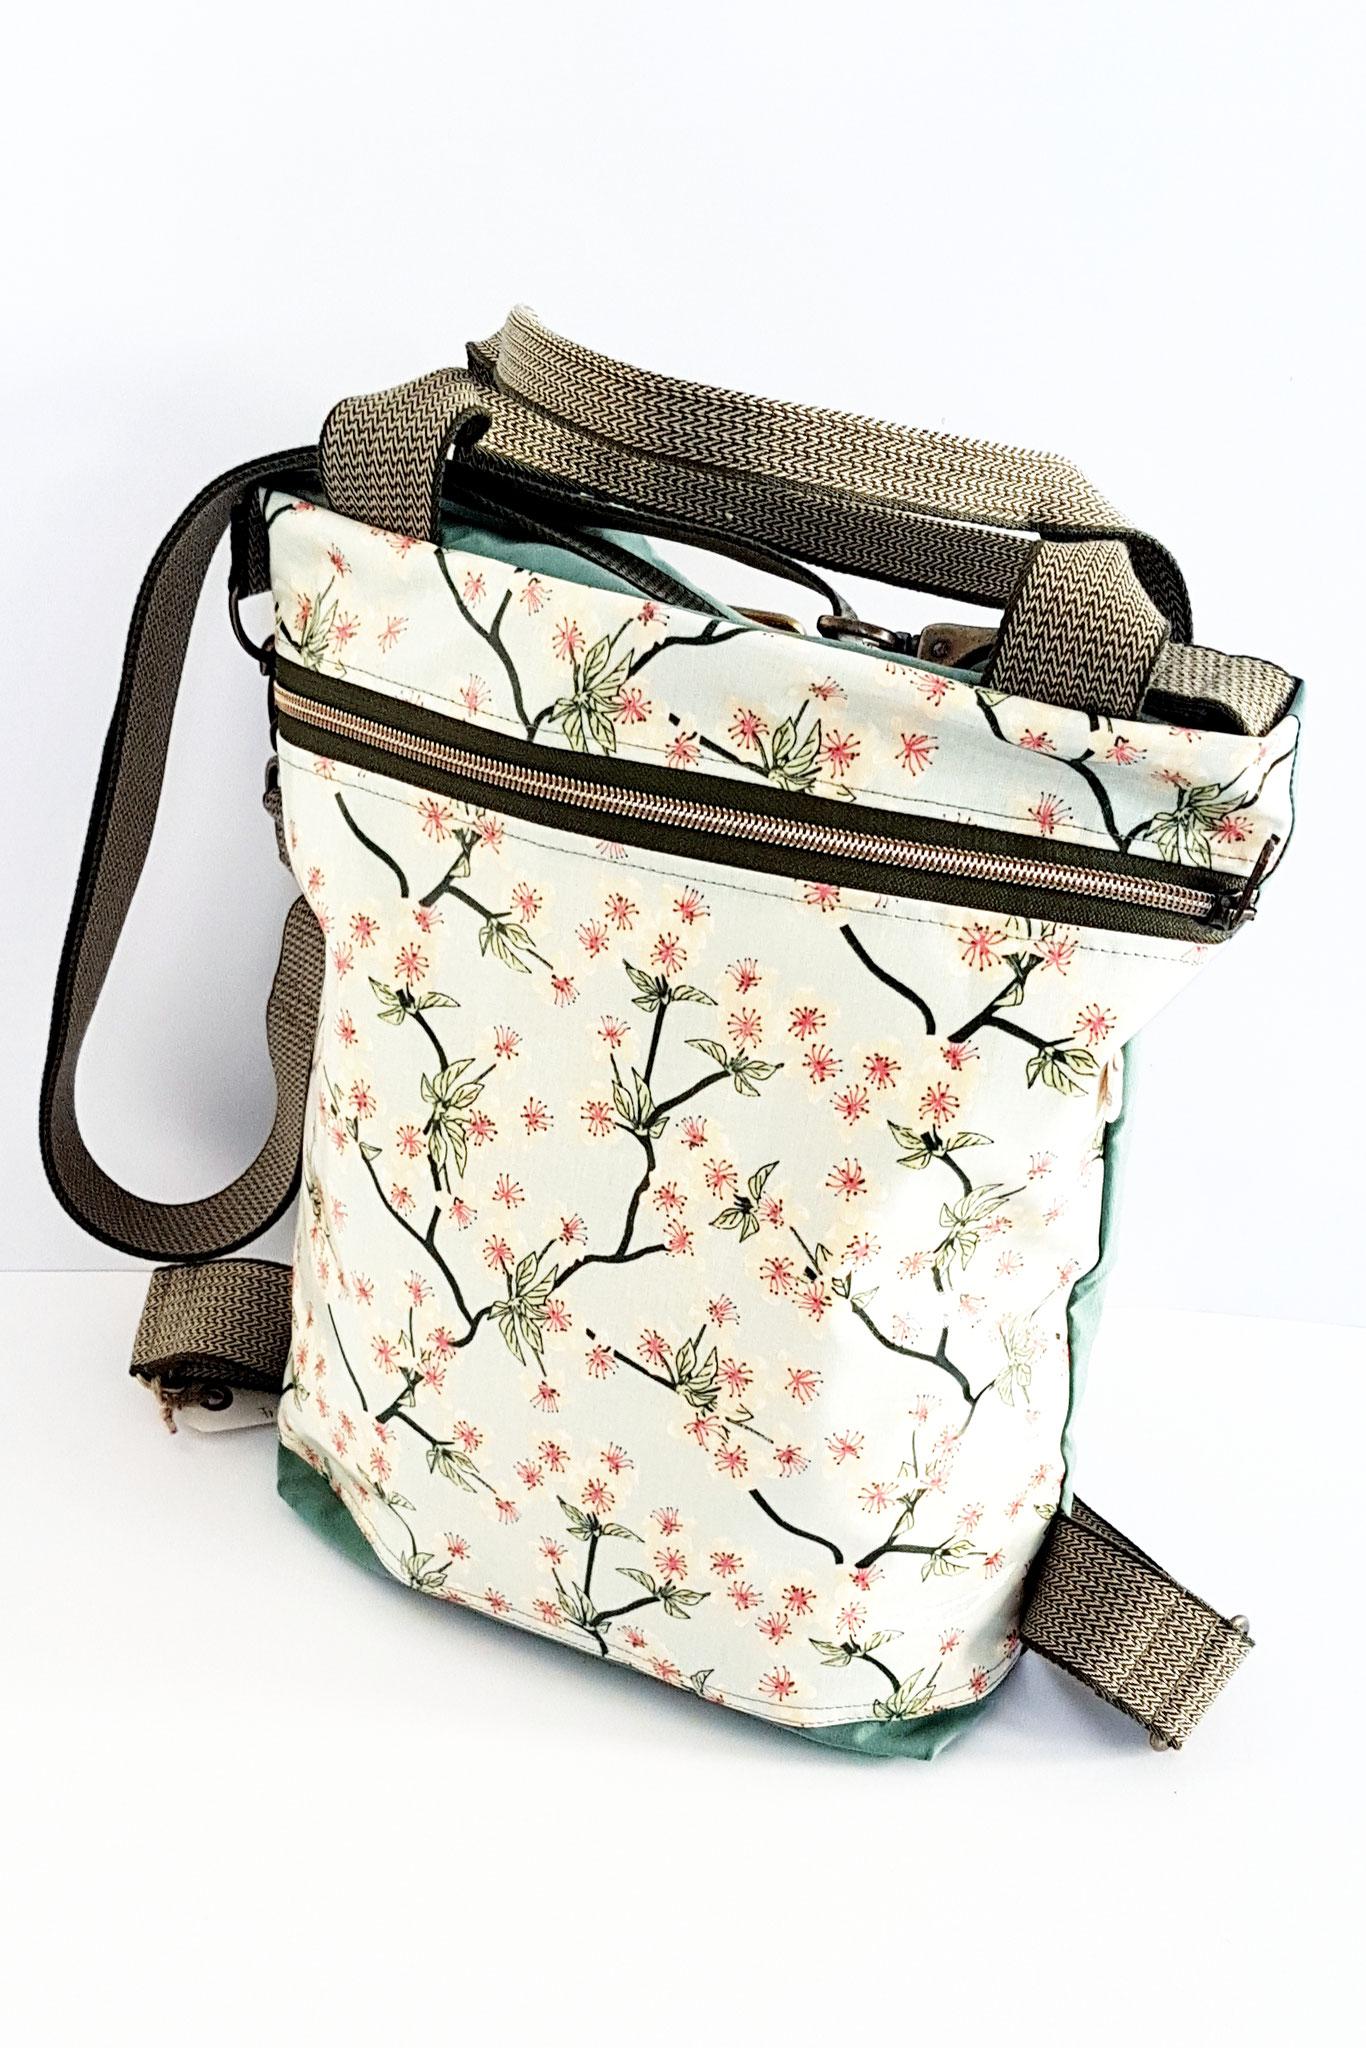 3in1 Bag, verkauft